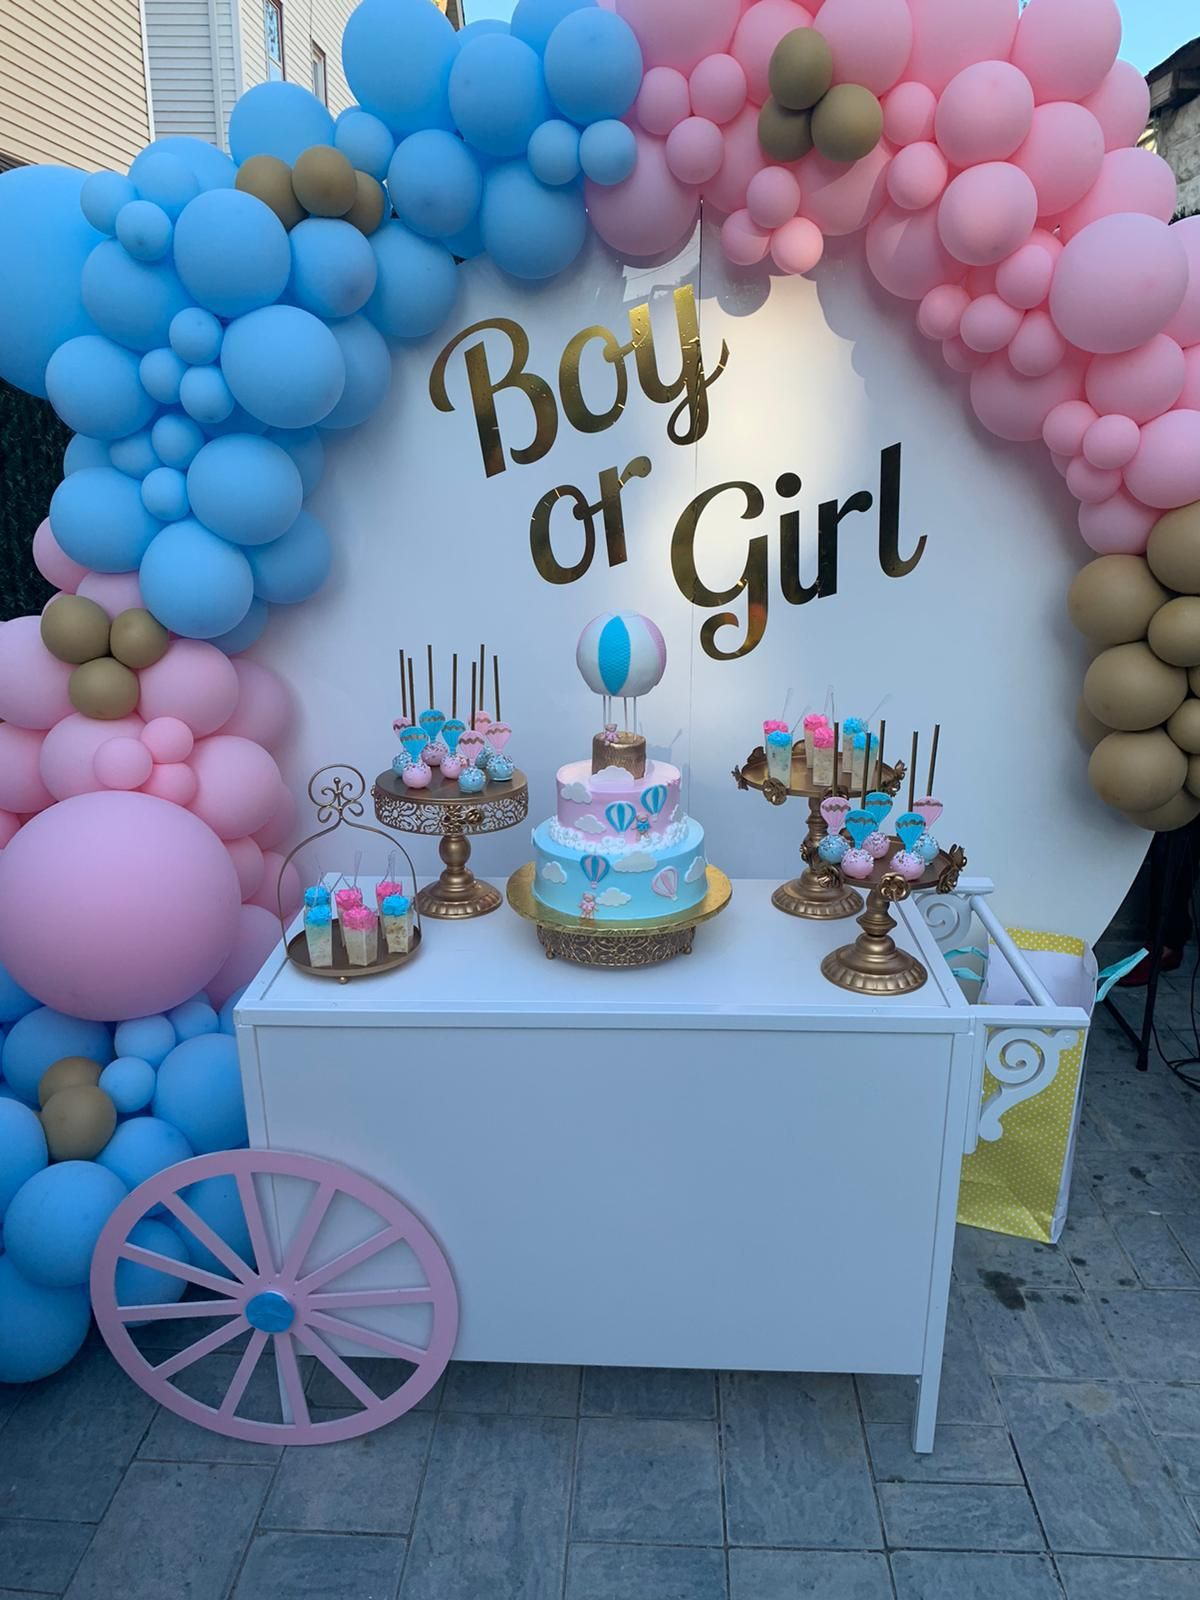 Gender Reveal Ideas Gender Reveal Decorations Gender Reveal Balloons Girl Gender Reveal